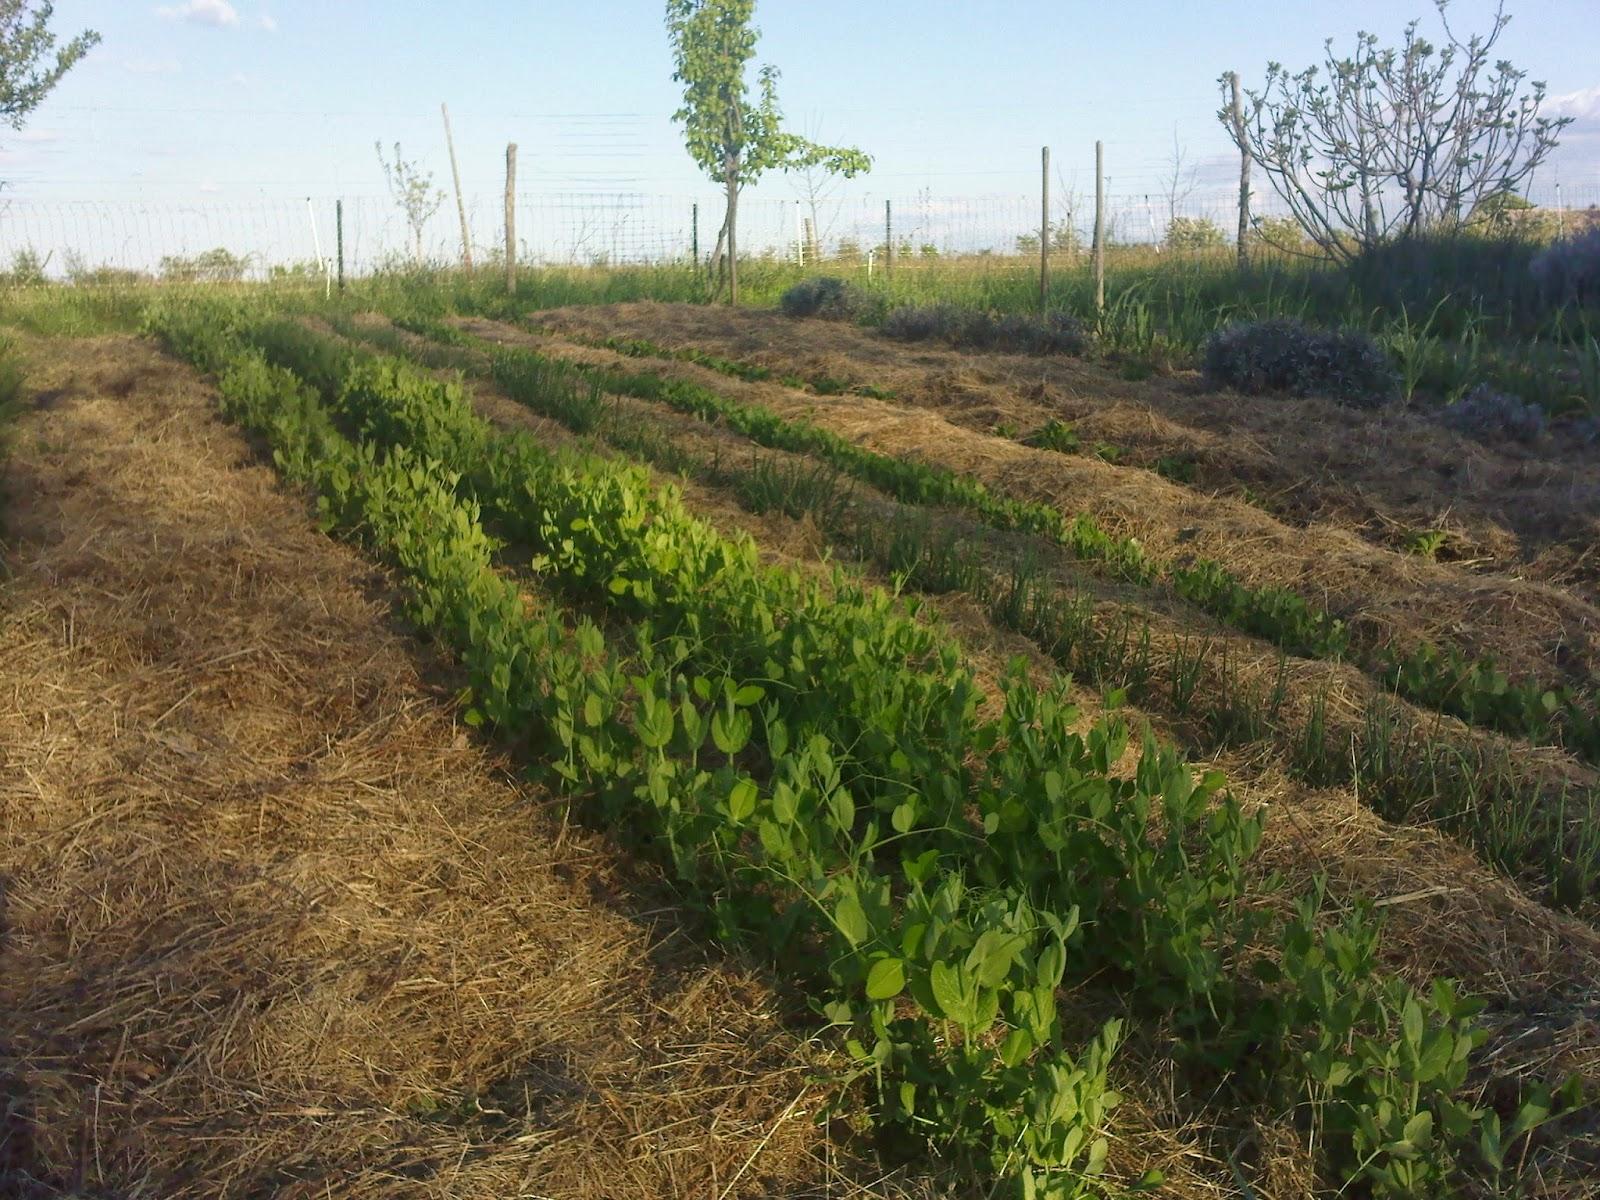 mach bio jardiner bio pesticides dans les jardins suites sans fin fukushima. Black Bedroom Furniture Sets. Home Design Ideas